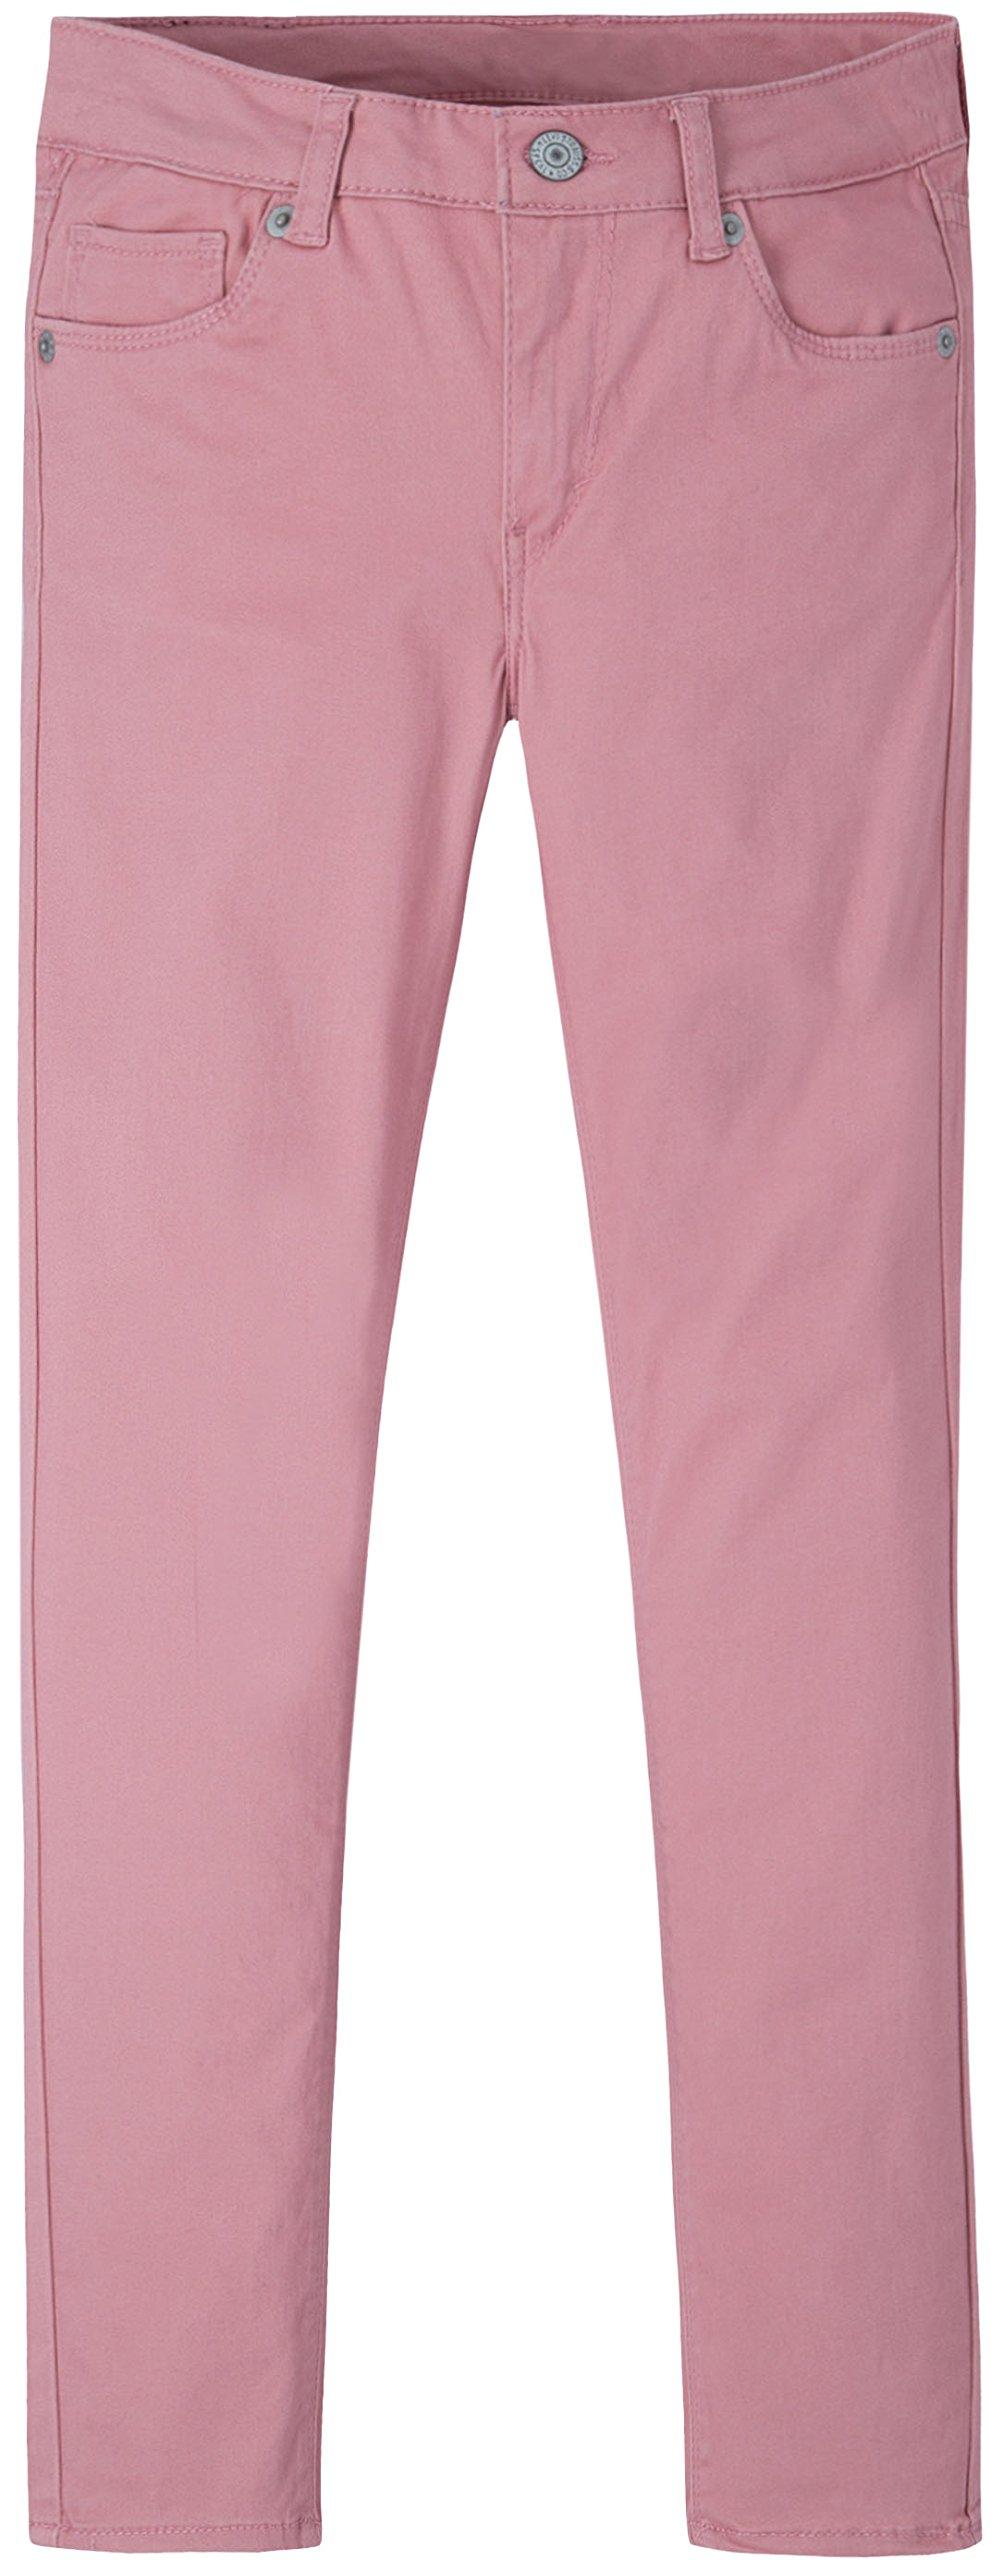 Levi's Big Girls' 710 Super Skinny Fit Soft Jeans, Blush, 16